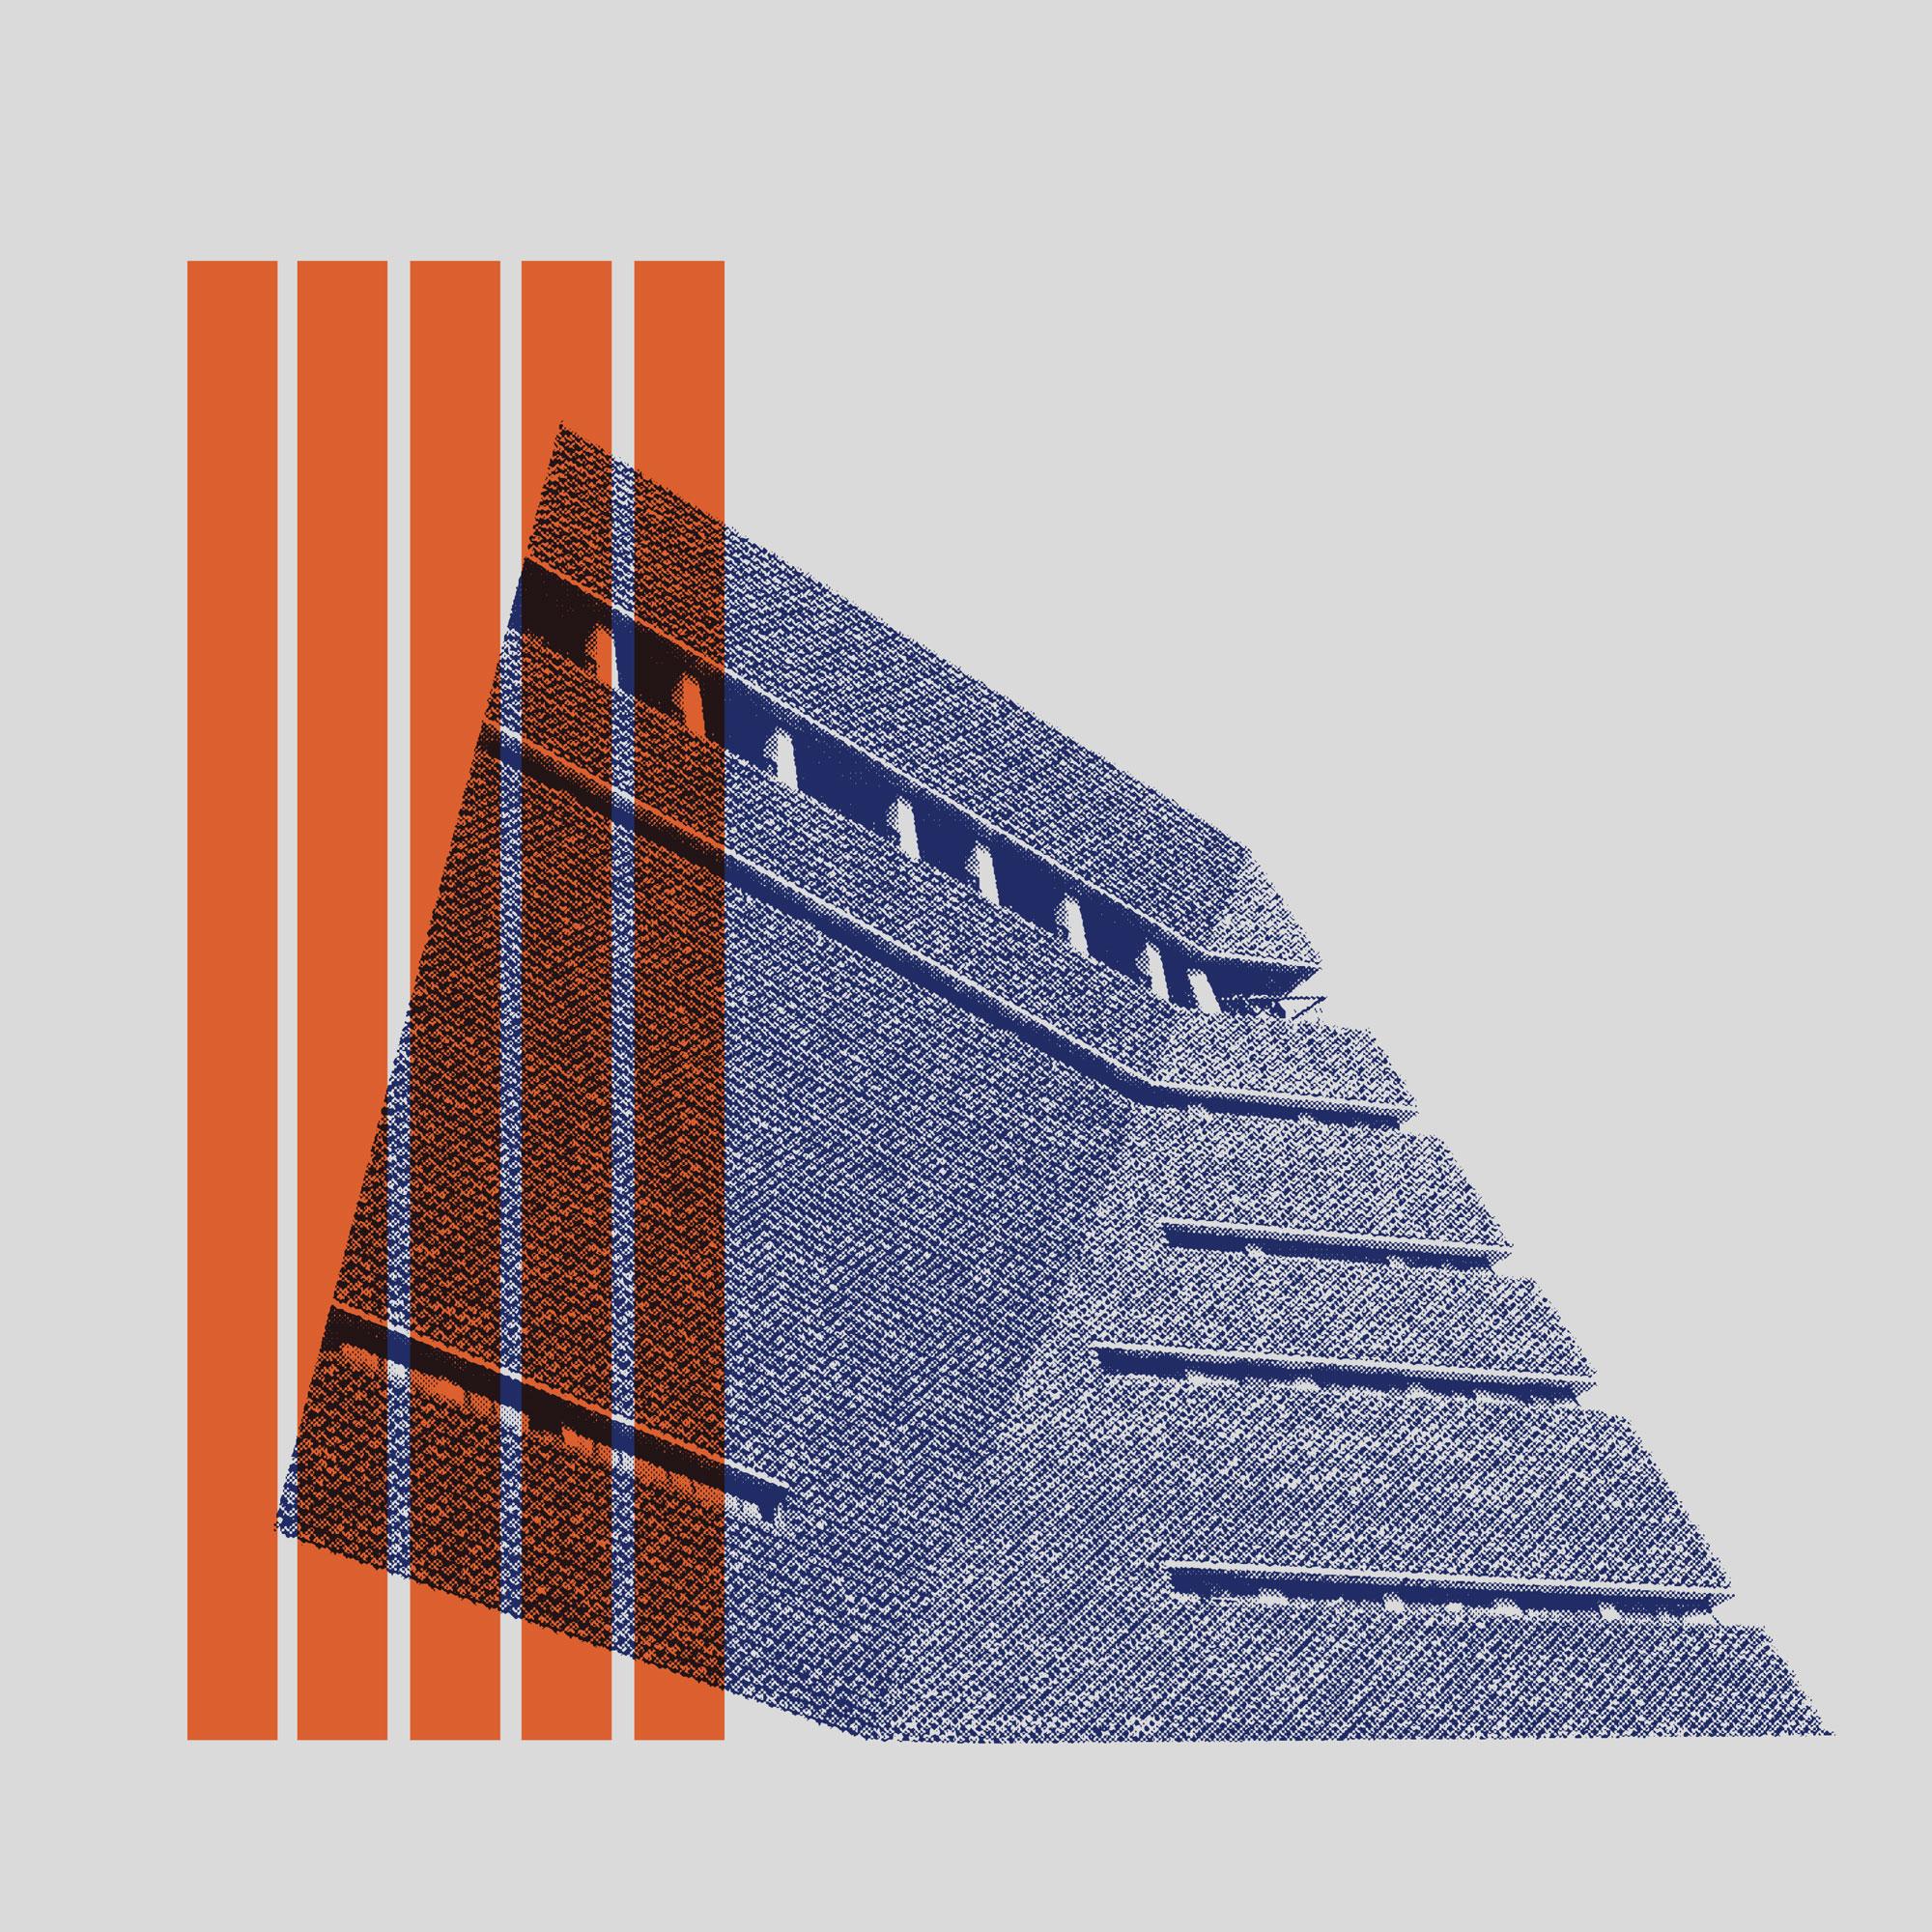 Underway-Studio-Tate-Tshirt-design-Final.jpg